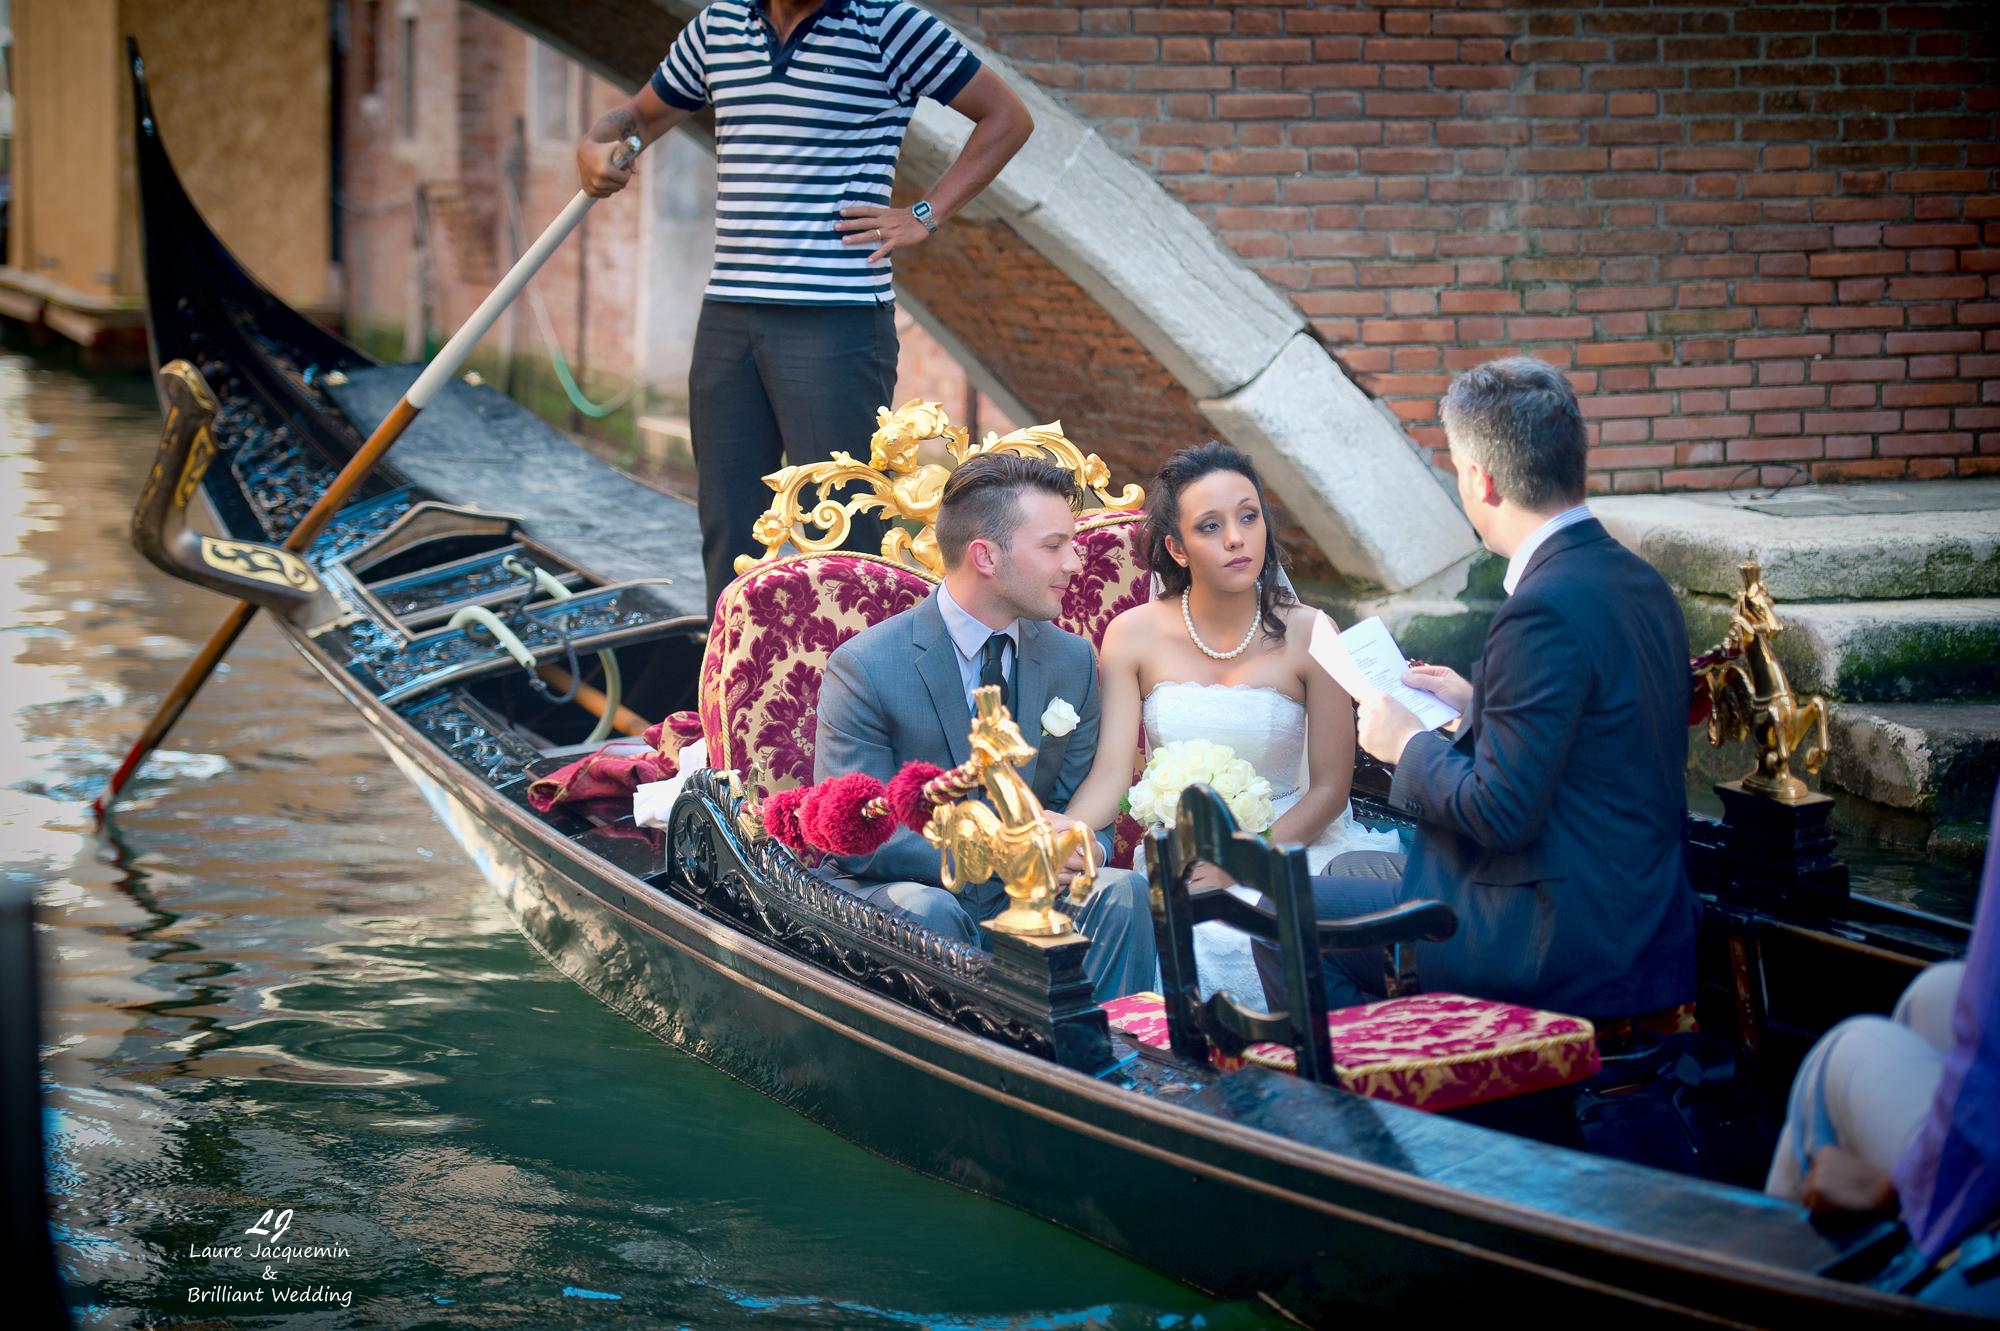 Venice Simbolic Wedding gondola venice Italy laure jacquemin photography (26) copia